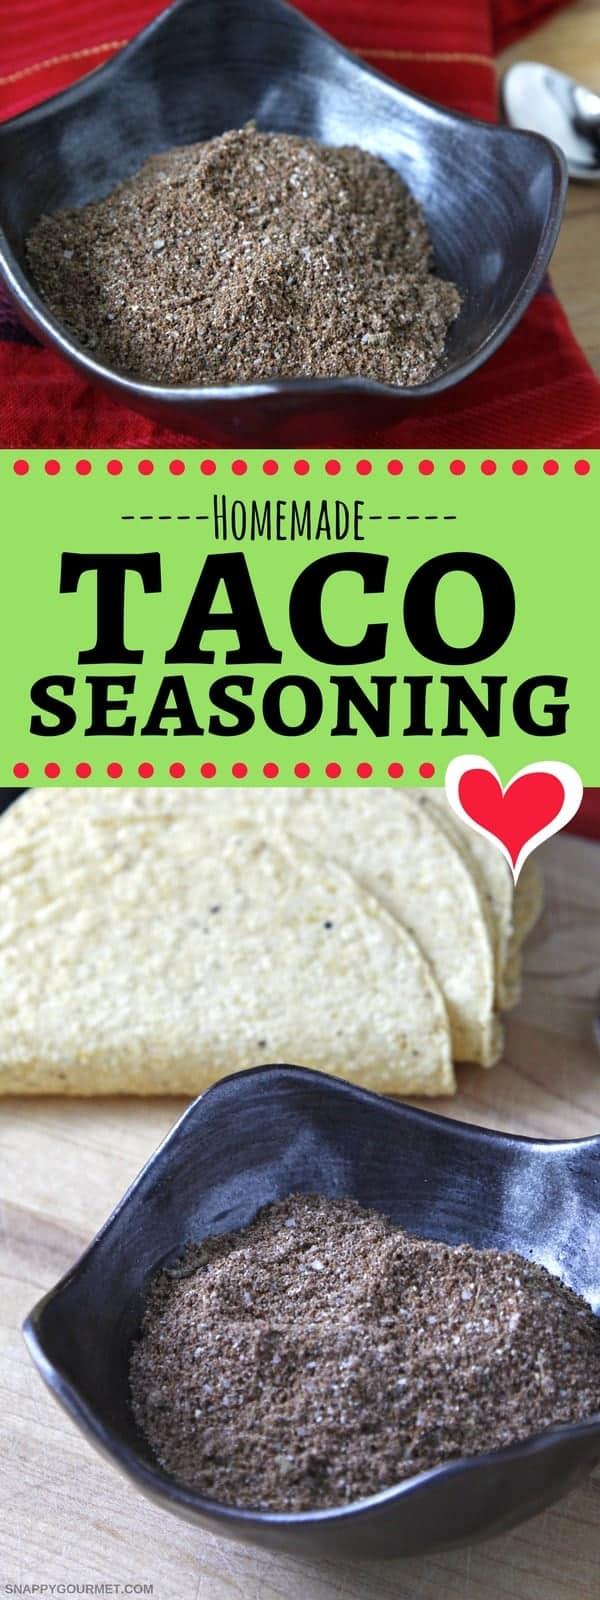 Mild Homemade Taco Seasoning Recipe - Snappy Gourmet